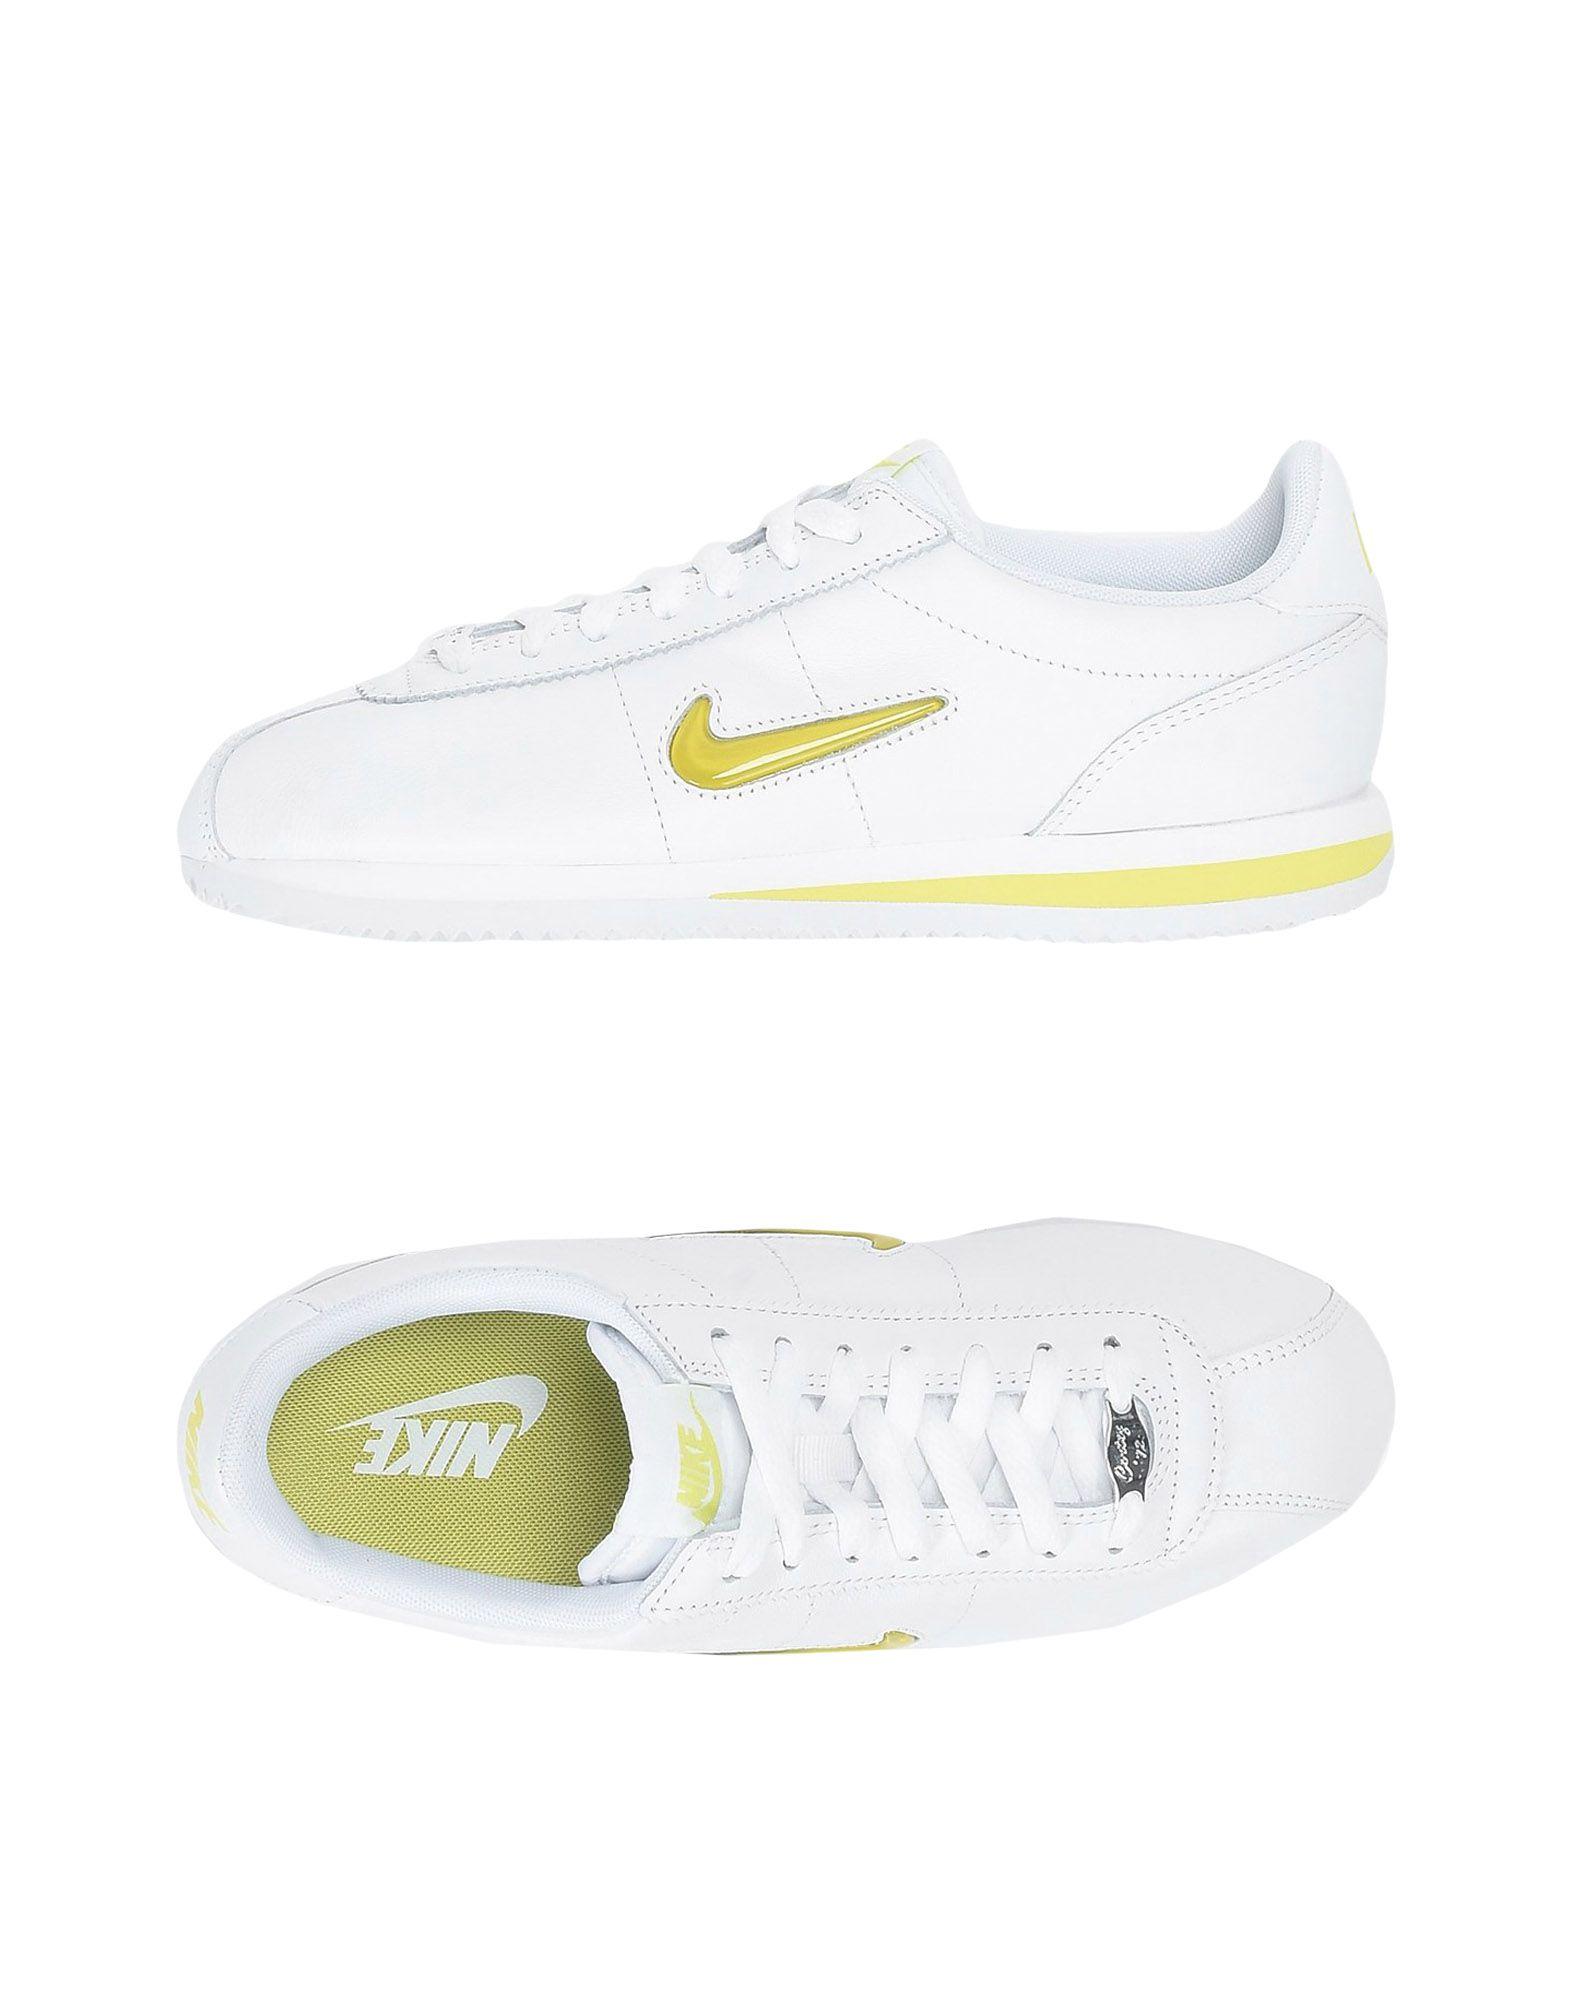 Sneakers Nike Cortez Basic Jewel '18 - Donna - 11497612FD